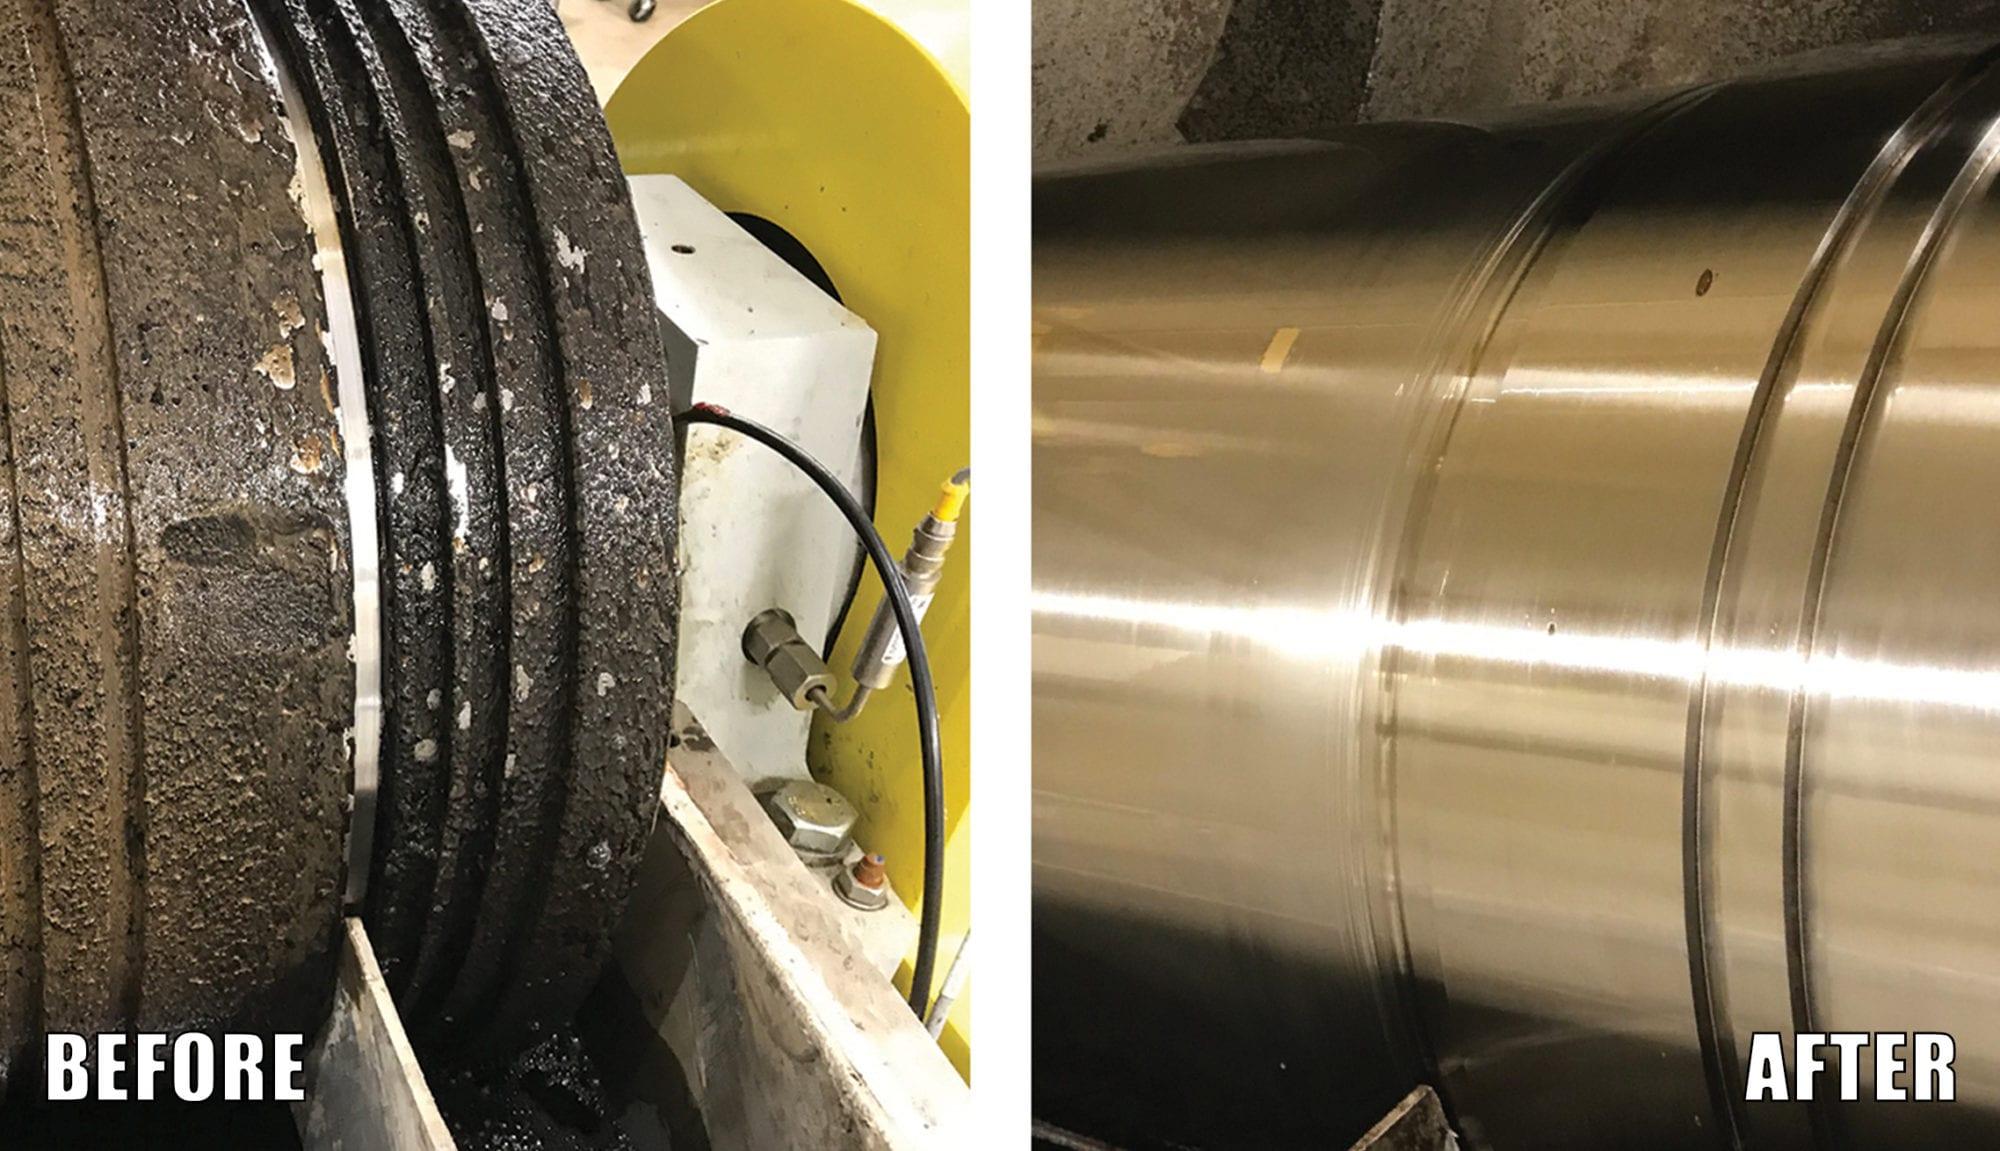 Centrifuge Cleaning of Struvite RYDLYME